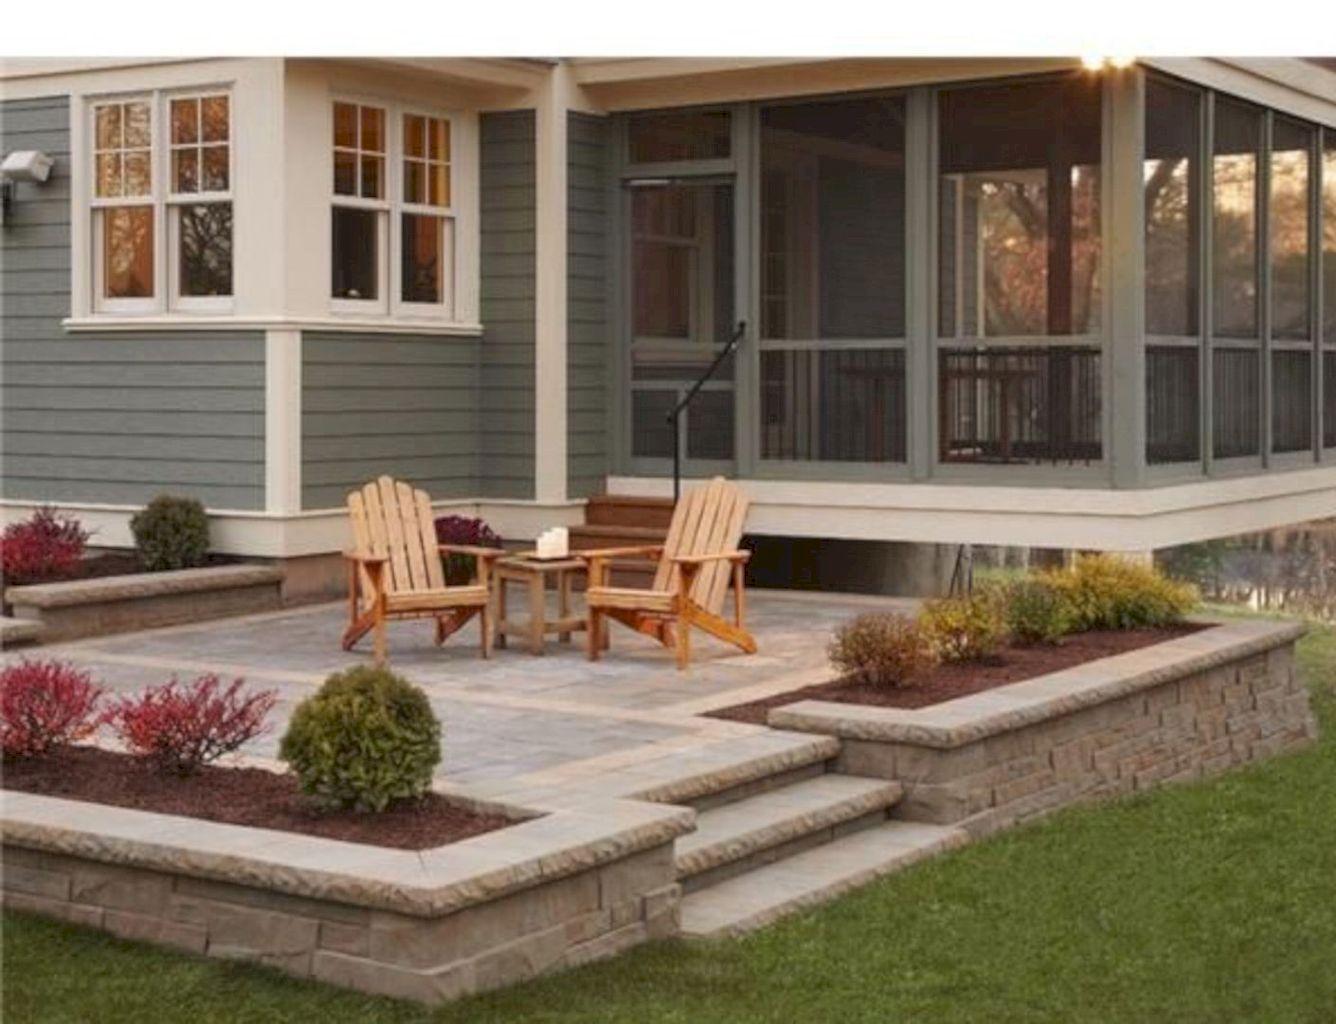 Adorable 40 cozy backyard patio design ideas httpshomeylife adorable 40 cozy backyard patio design ideas httpshomeylife40 solutioingenieria Images